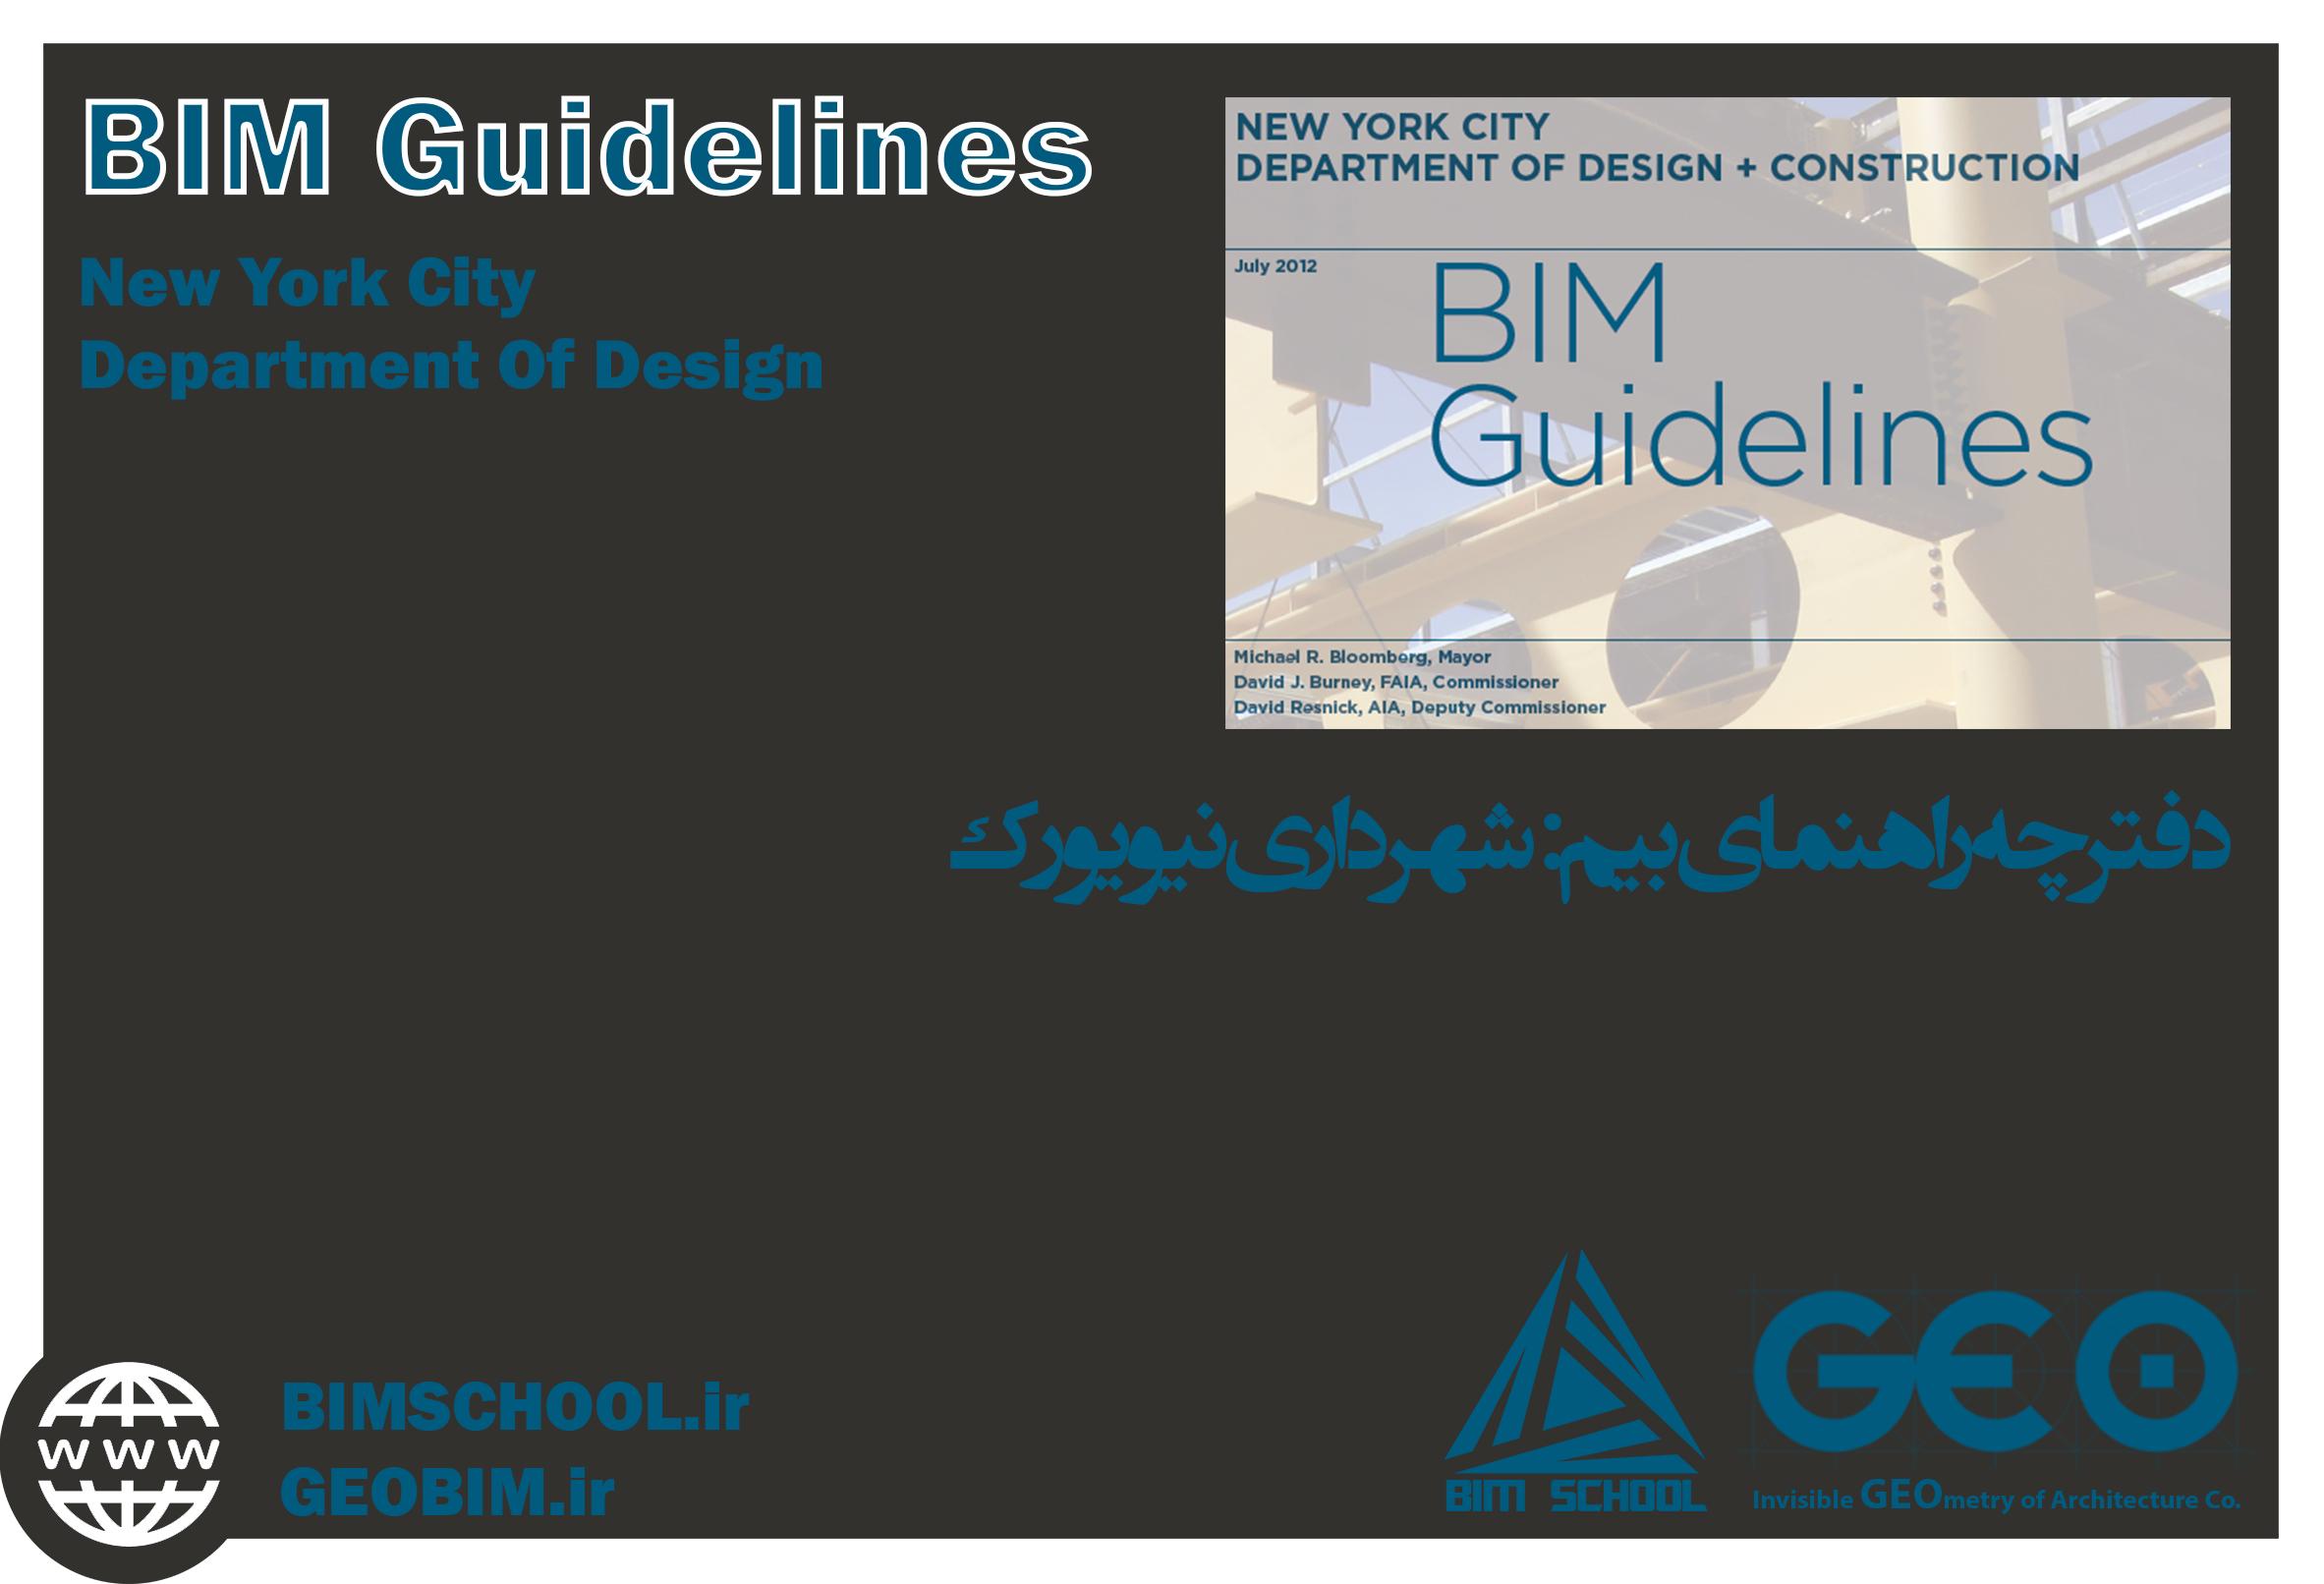 ddc_bim_guidelines(WWW.BIMSCHOOL.ir-WWW.GEOBIM.ir)